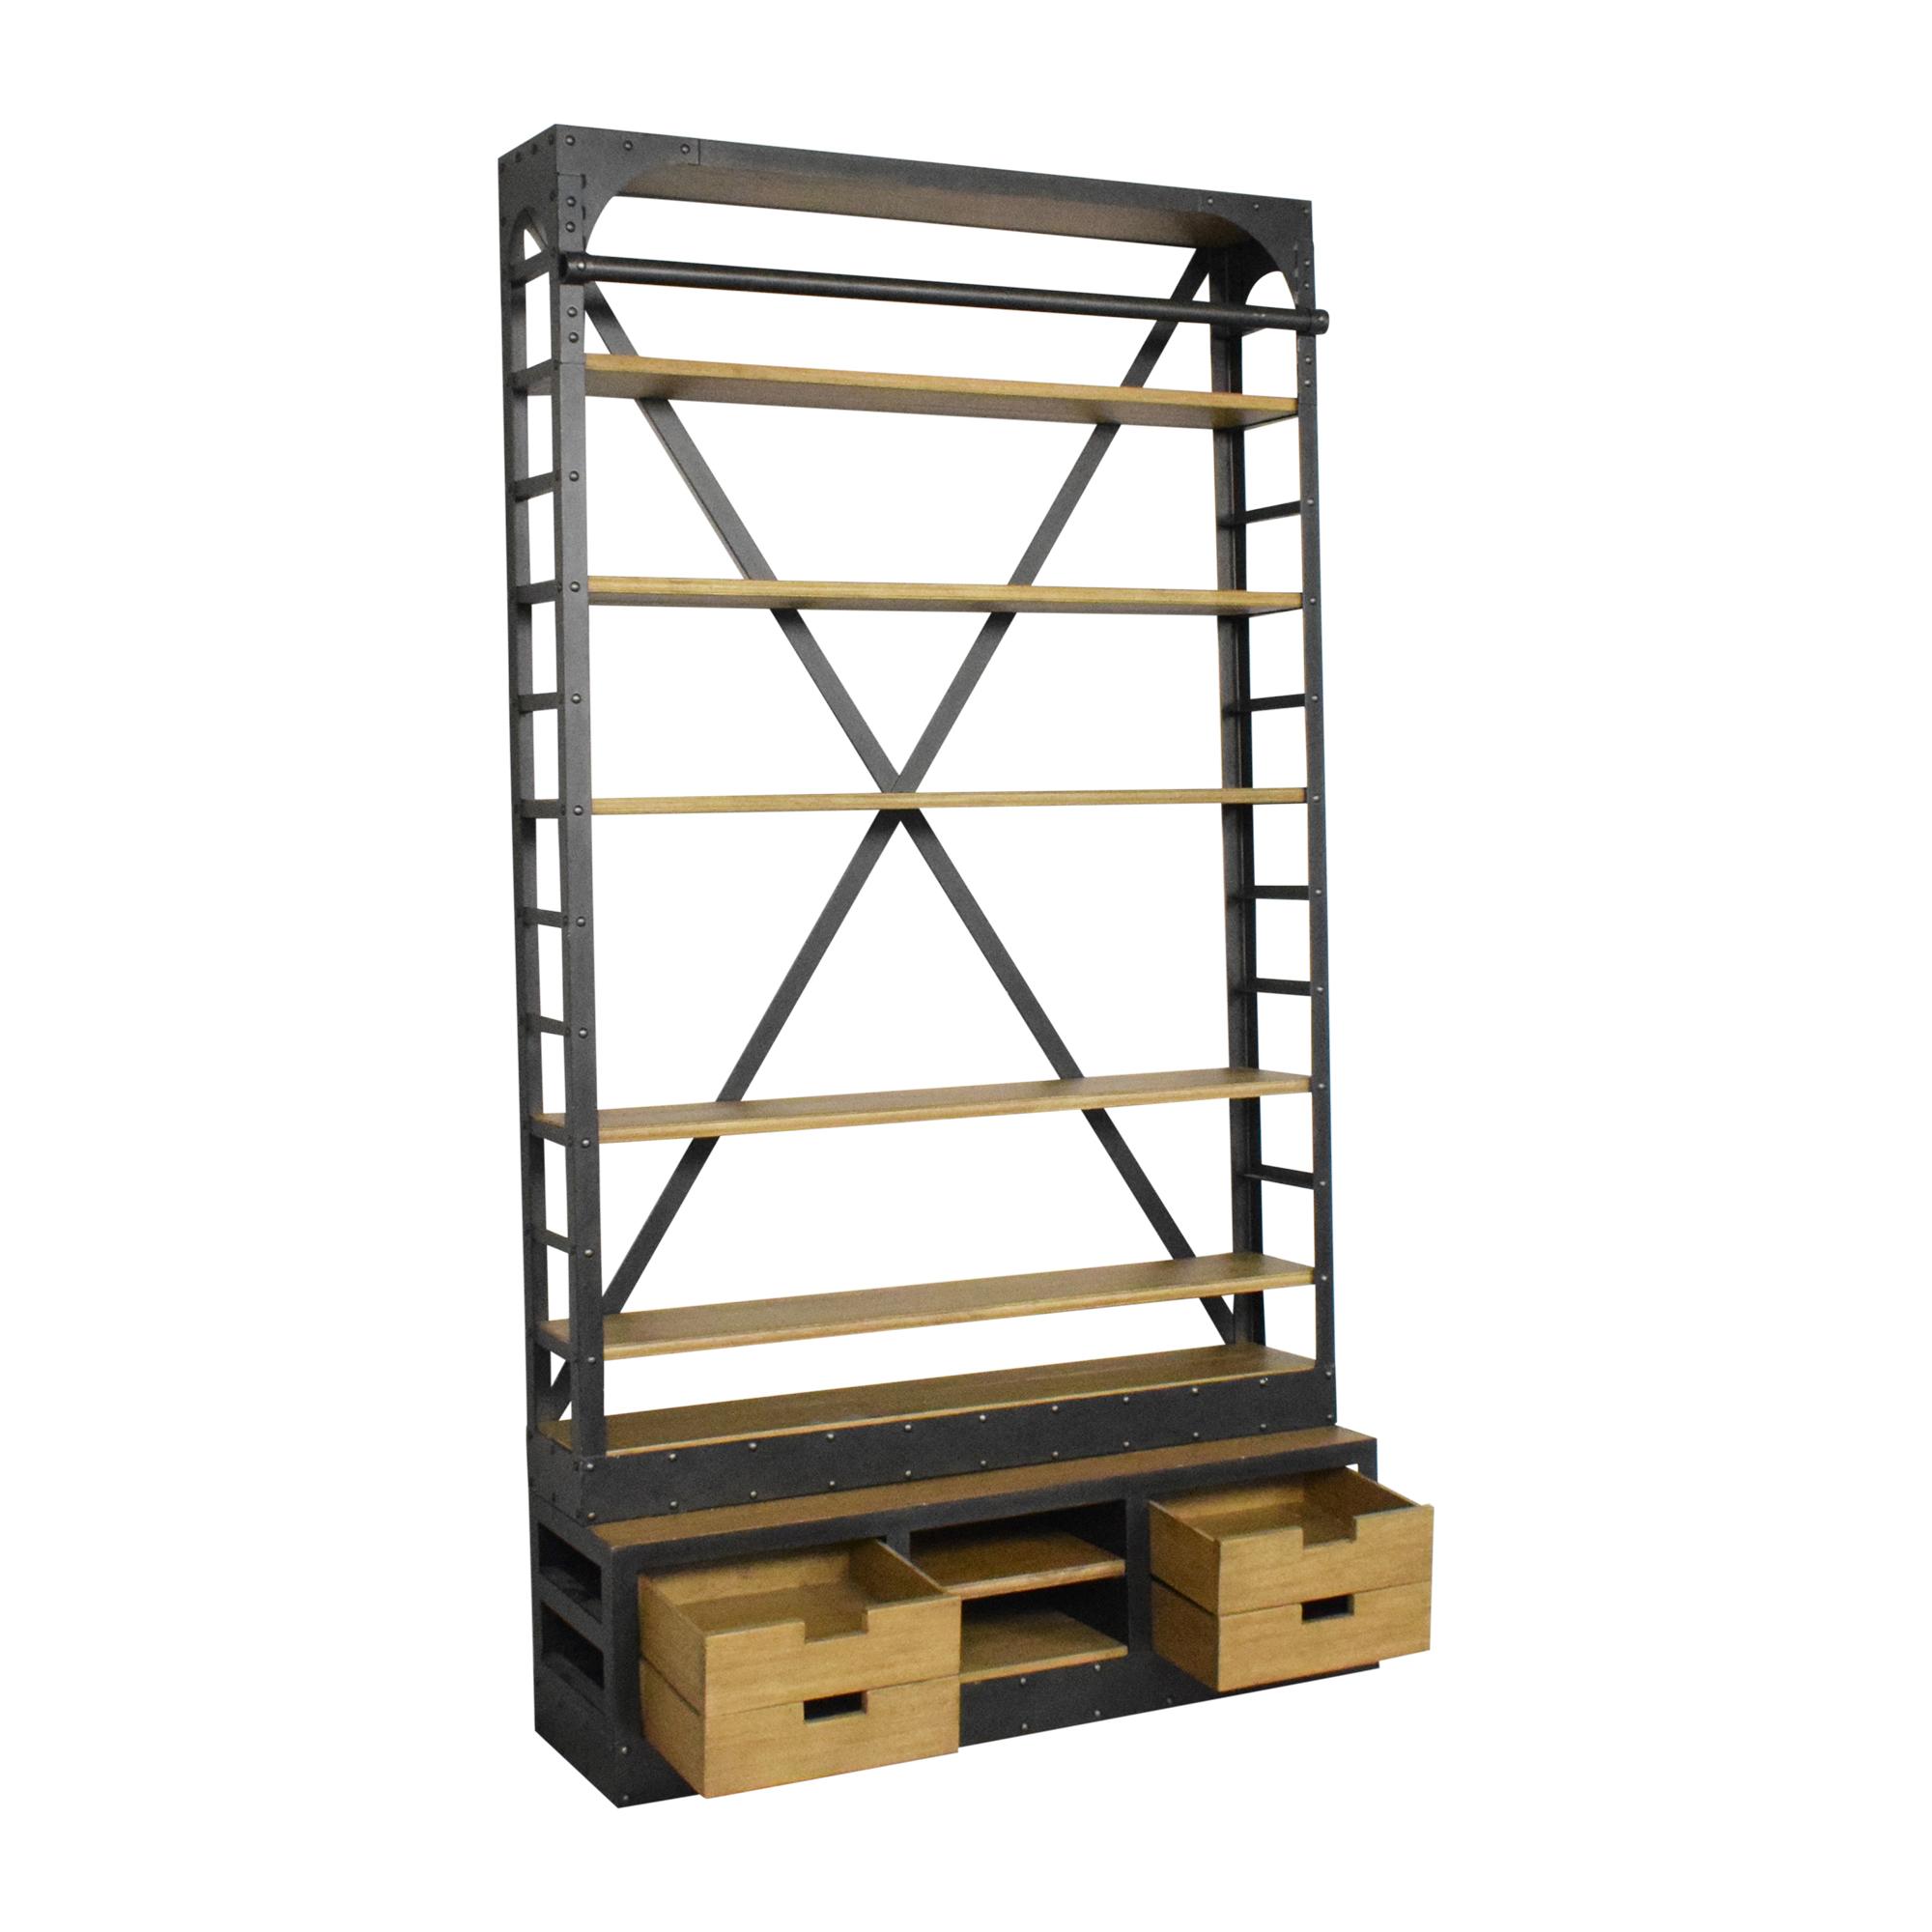 buy Restoration Hardware 1950s Dutch Shipyard Triple Shelving Restoration Hardware Bookcases & Shelving